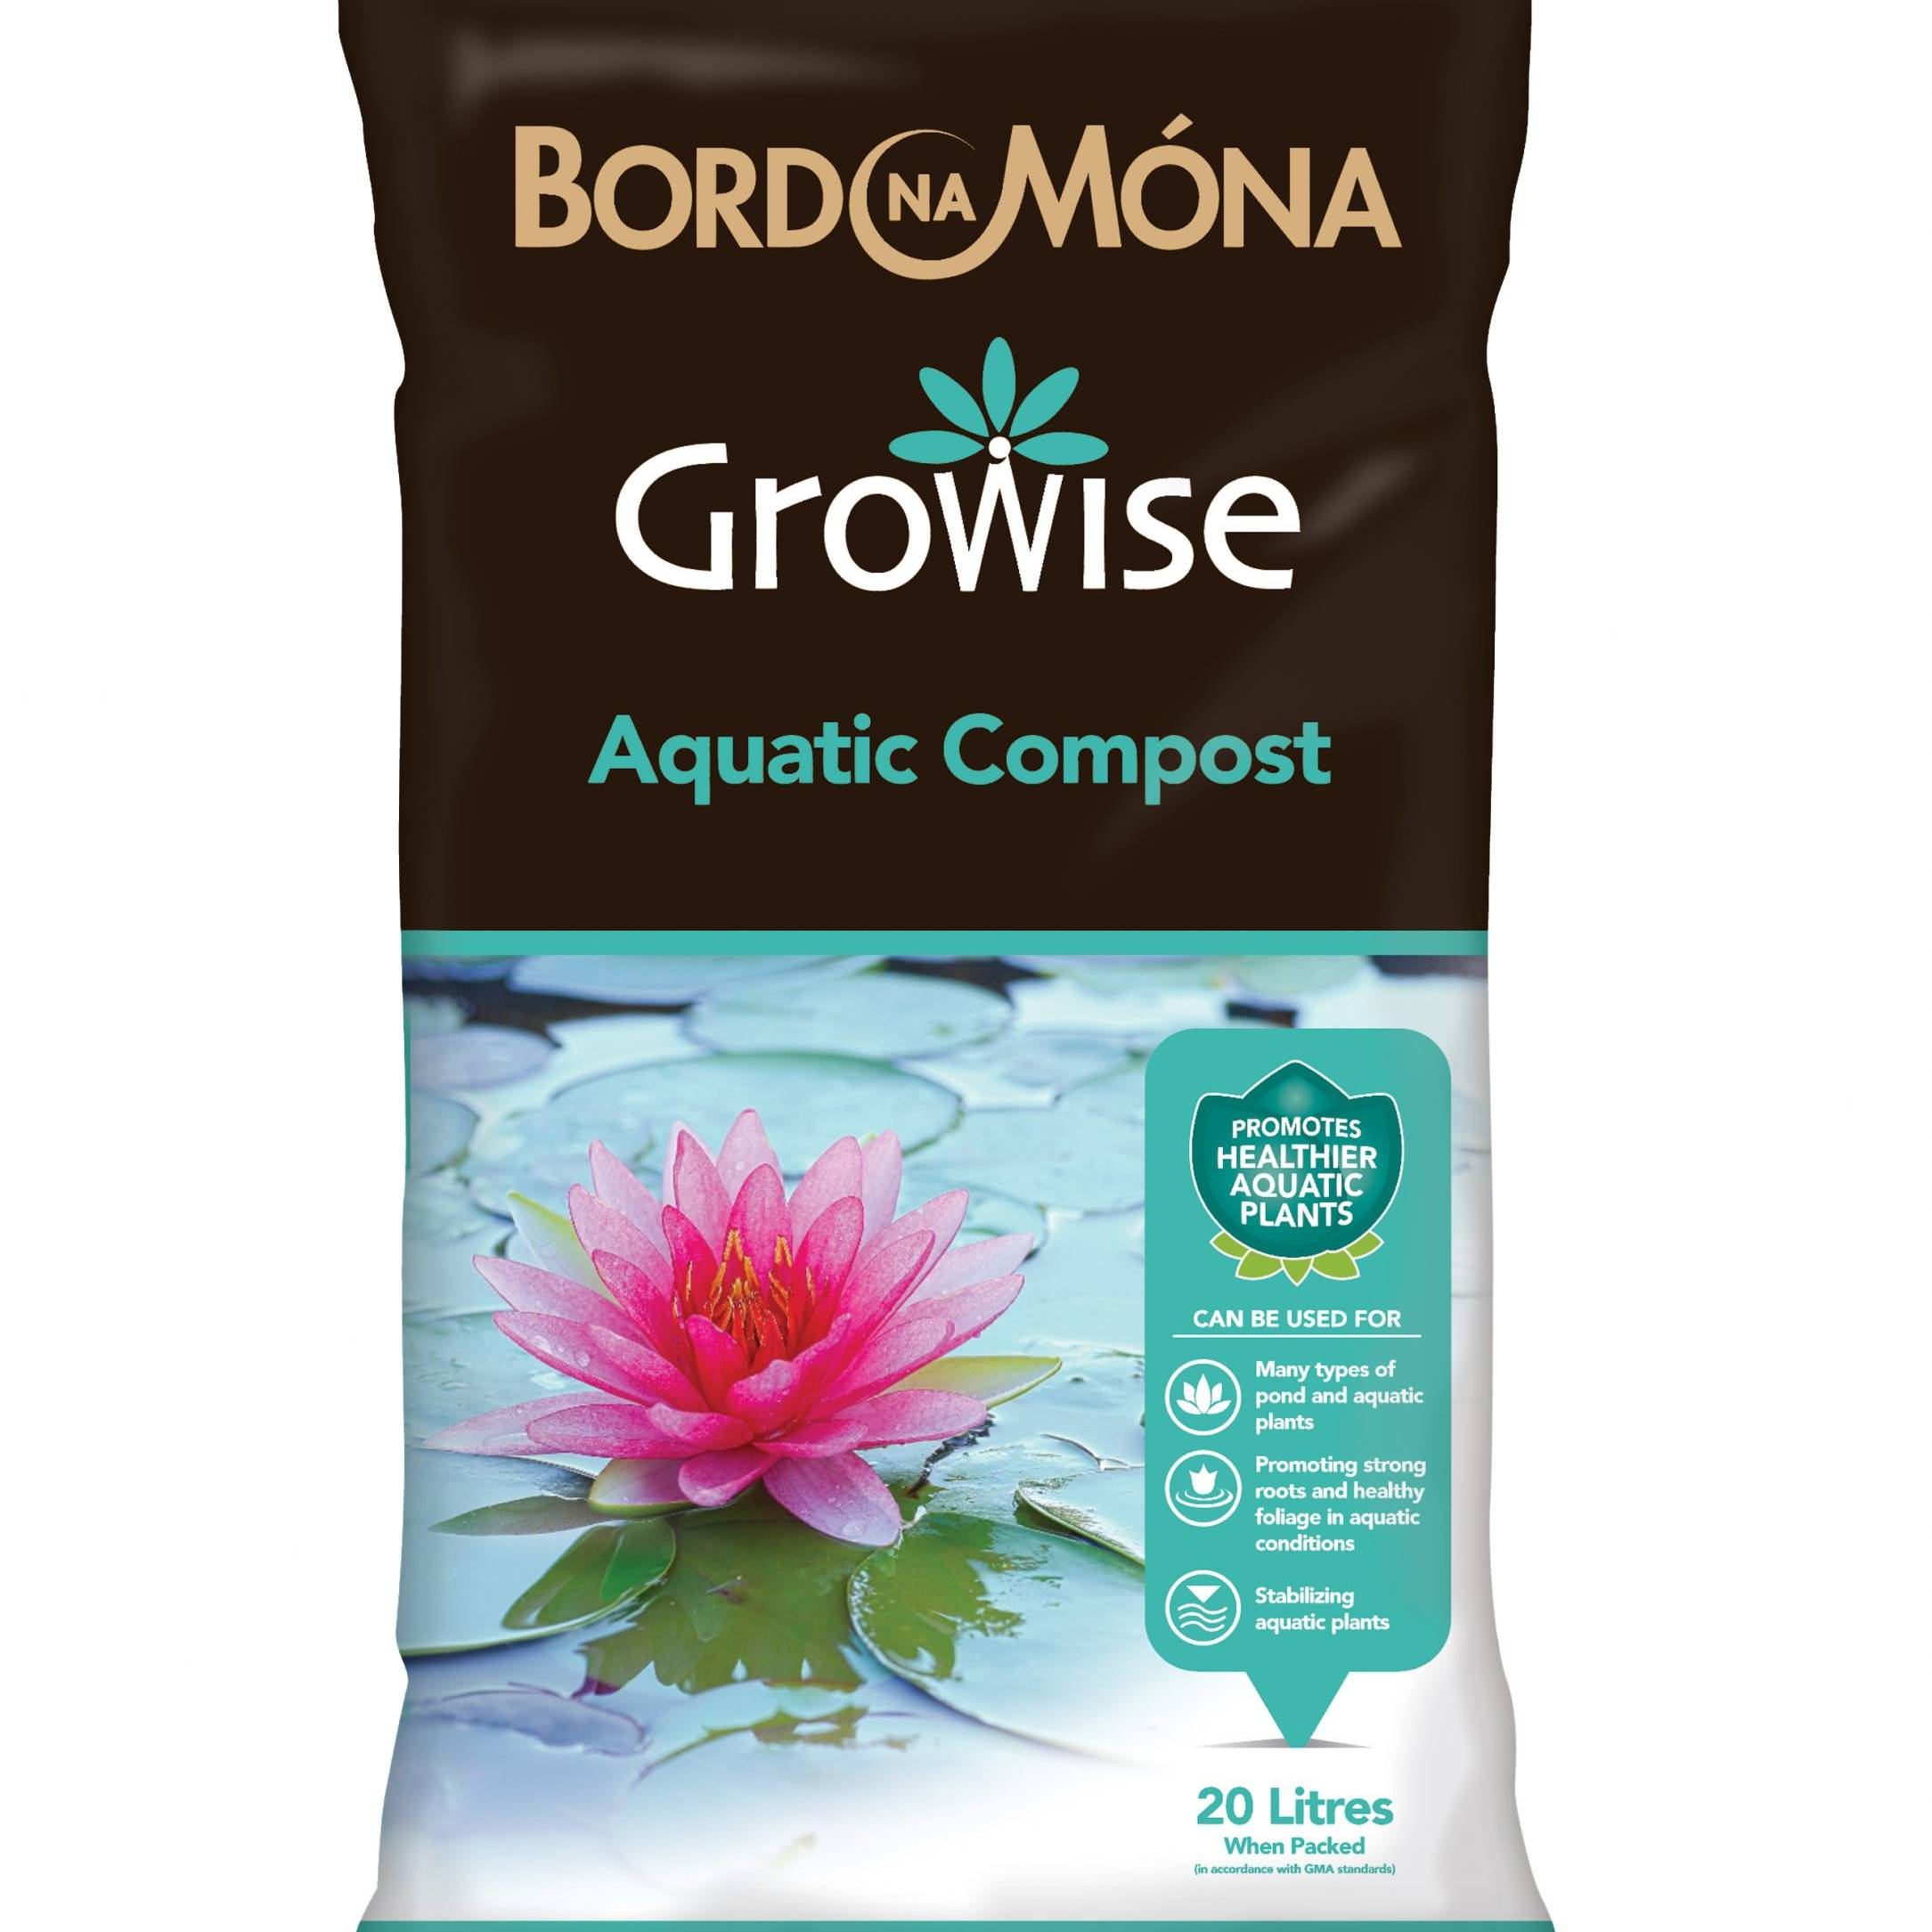 Bordnamona Growise Aquatic Compost 20L